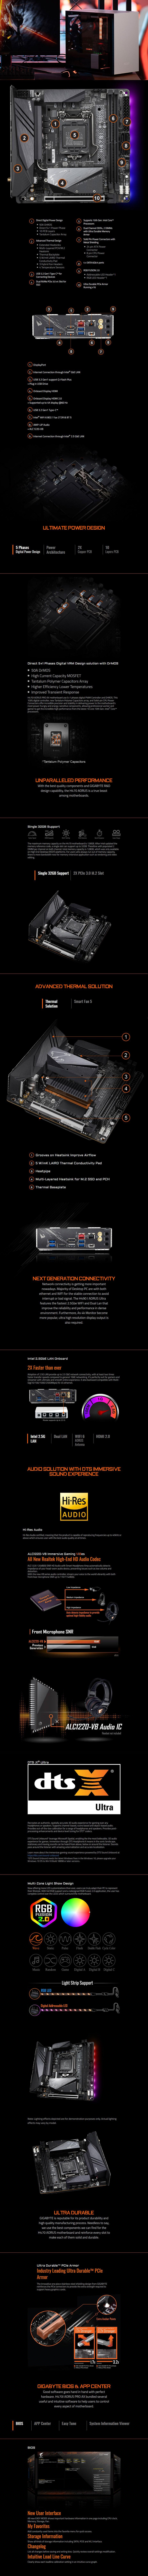 Gigabyte H470I AORUS PRO AX LGA 1200 Mini-ITX Motherboard - Overview 1